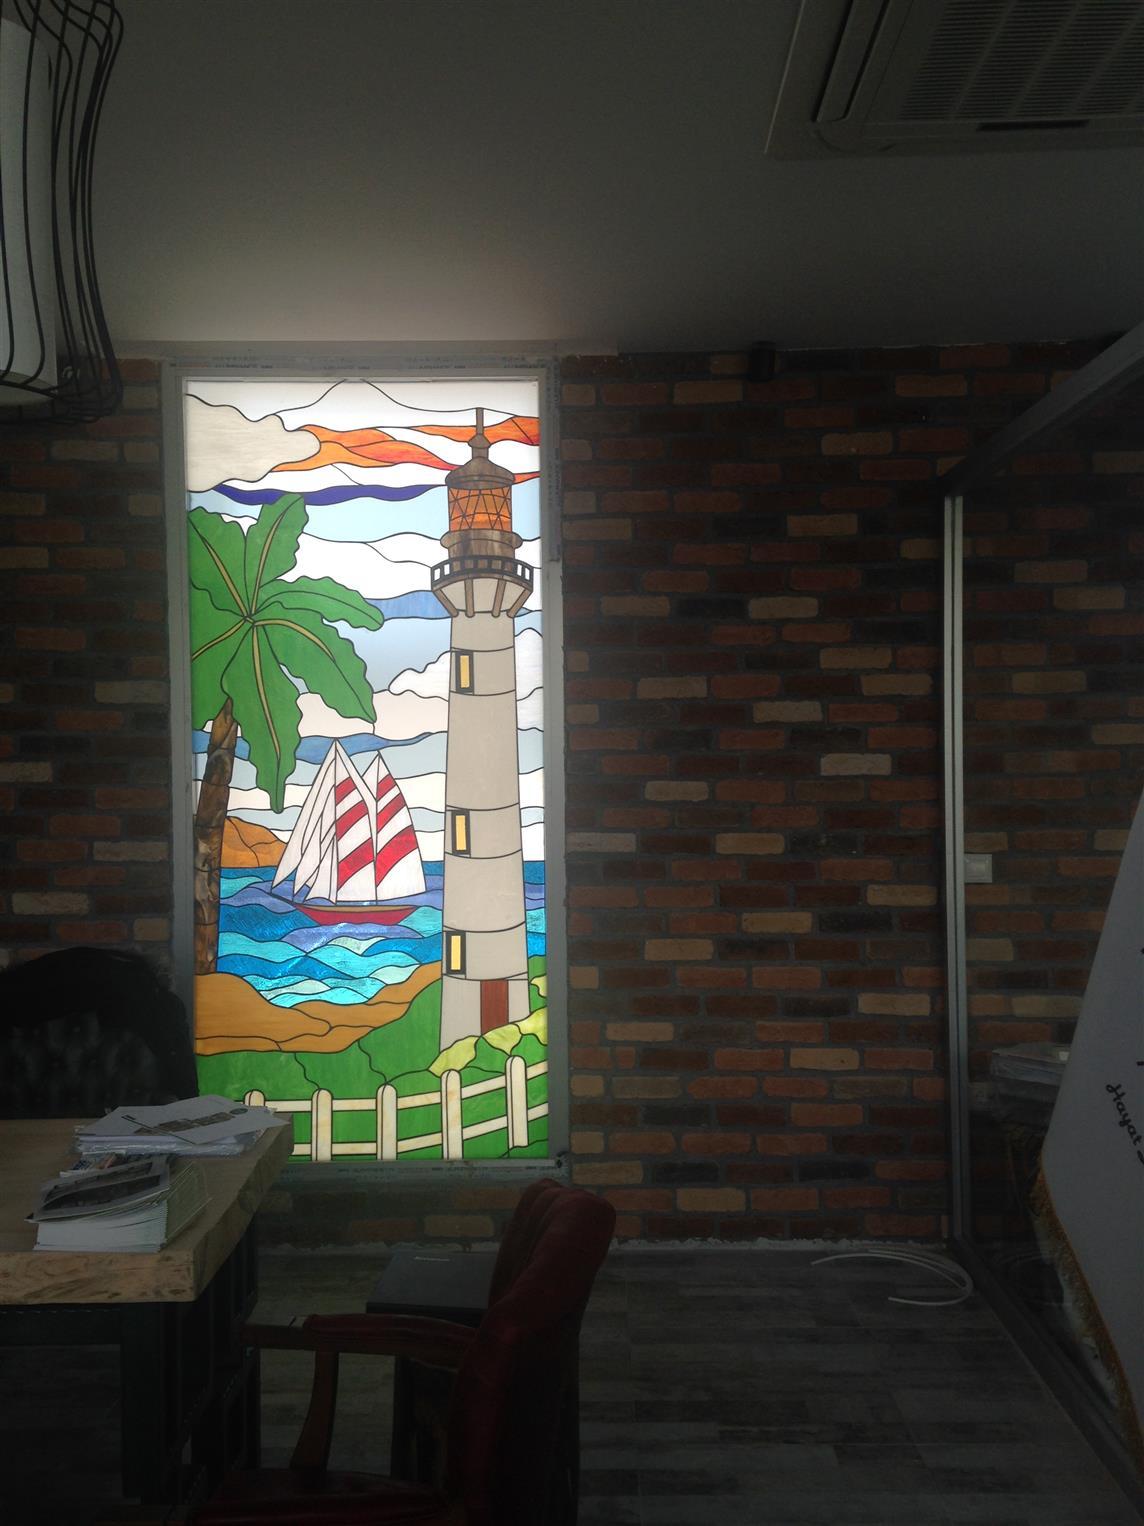 izka-insaat-park-yasam-atasehir201652133136478.jpg izmir vitray çalışması